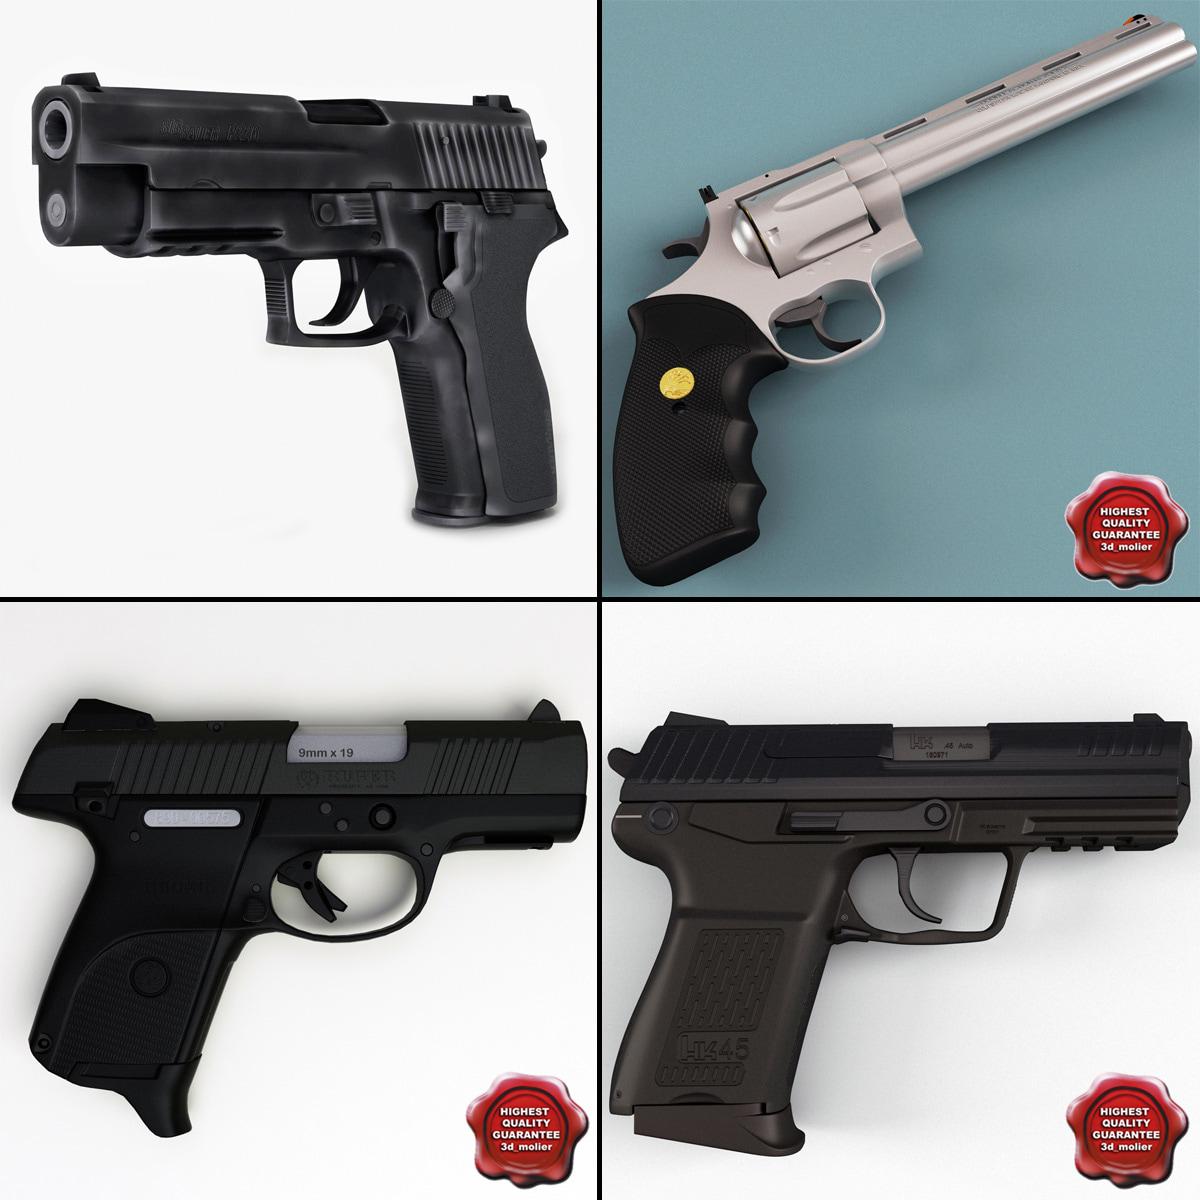 Pistols_Collection_V3_000.jpg